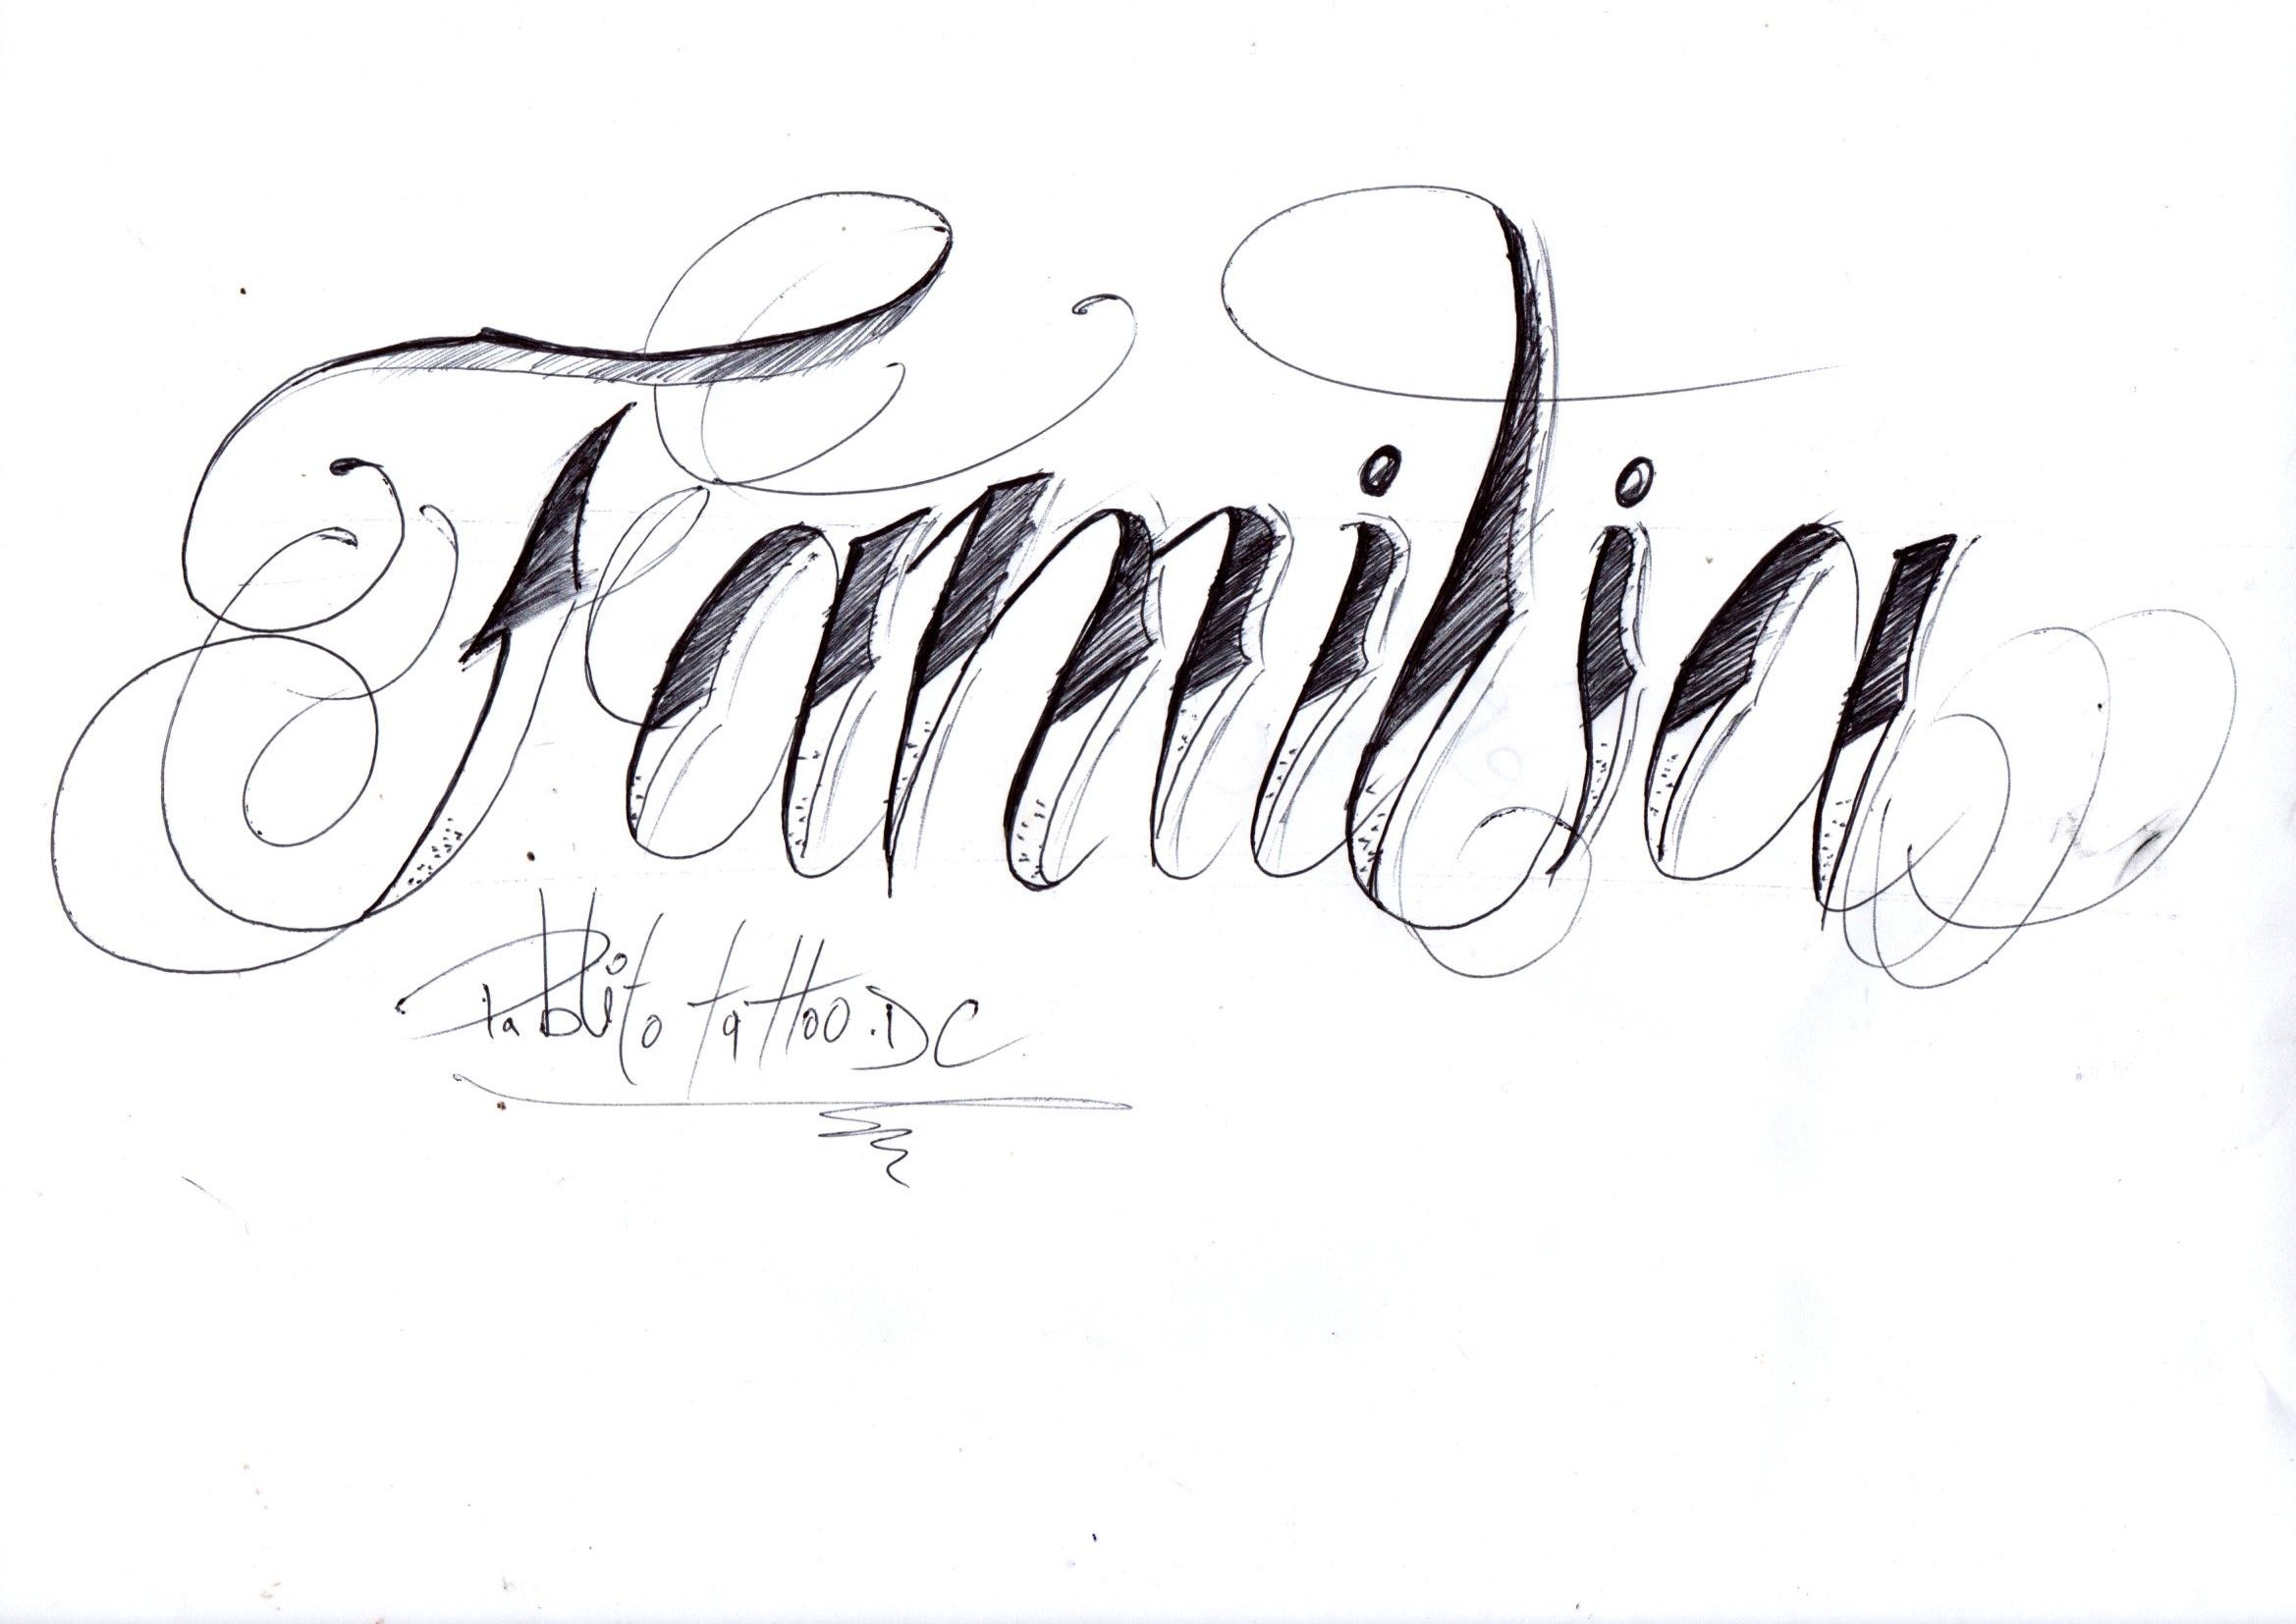 Familia En 2020 Disenos De Letras Letras Para Tatuajes Diferentes Tatuajes